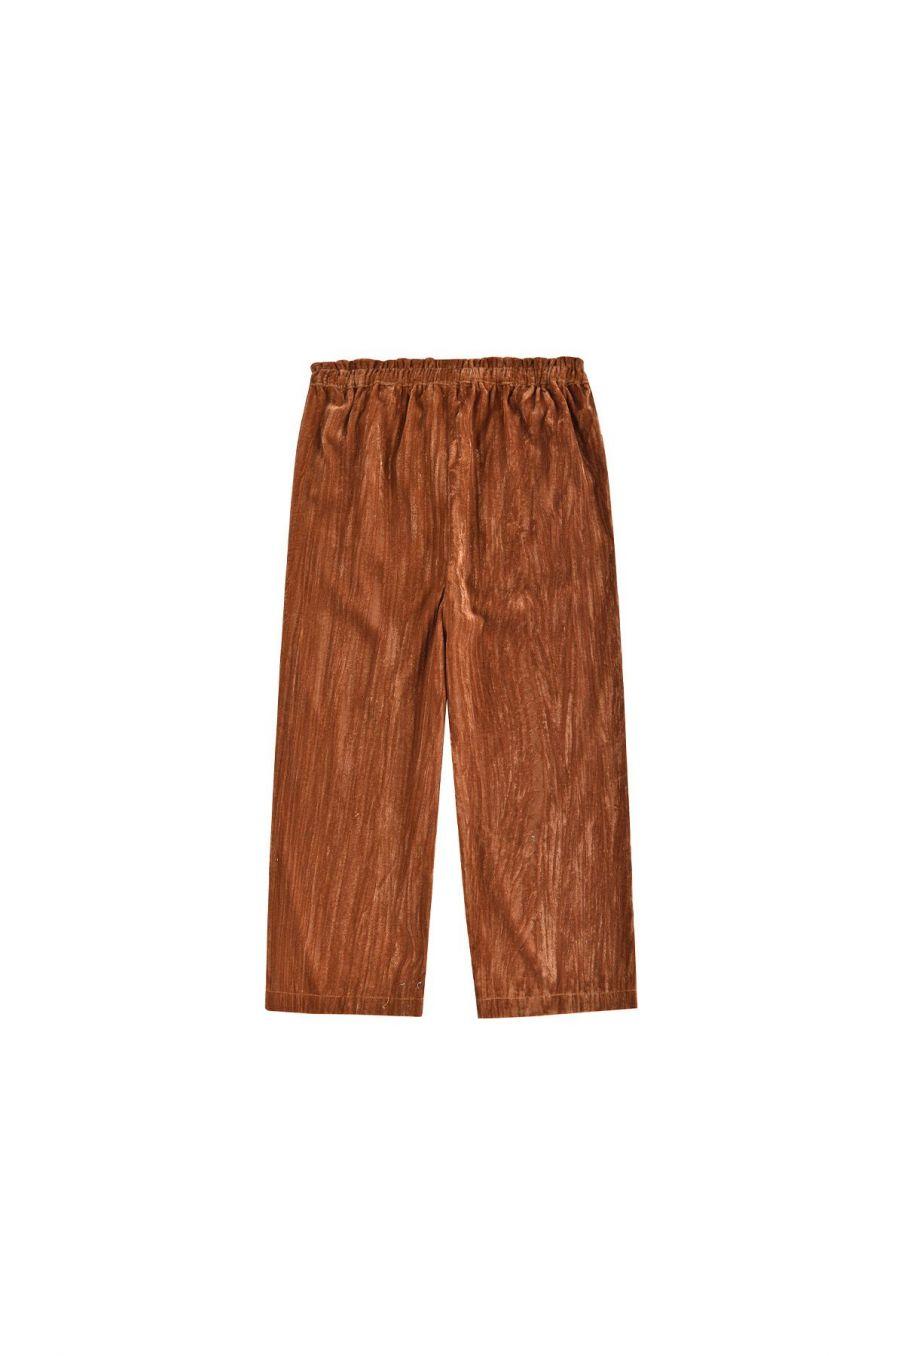 pantalon fille noellice caramel - louise misha